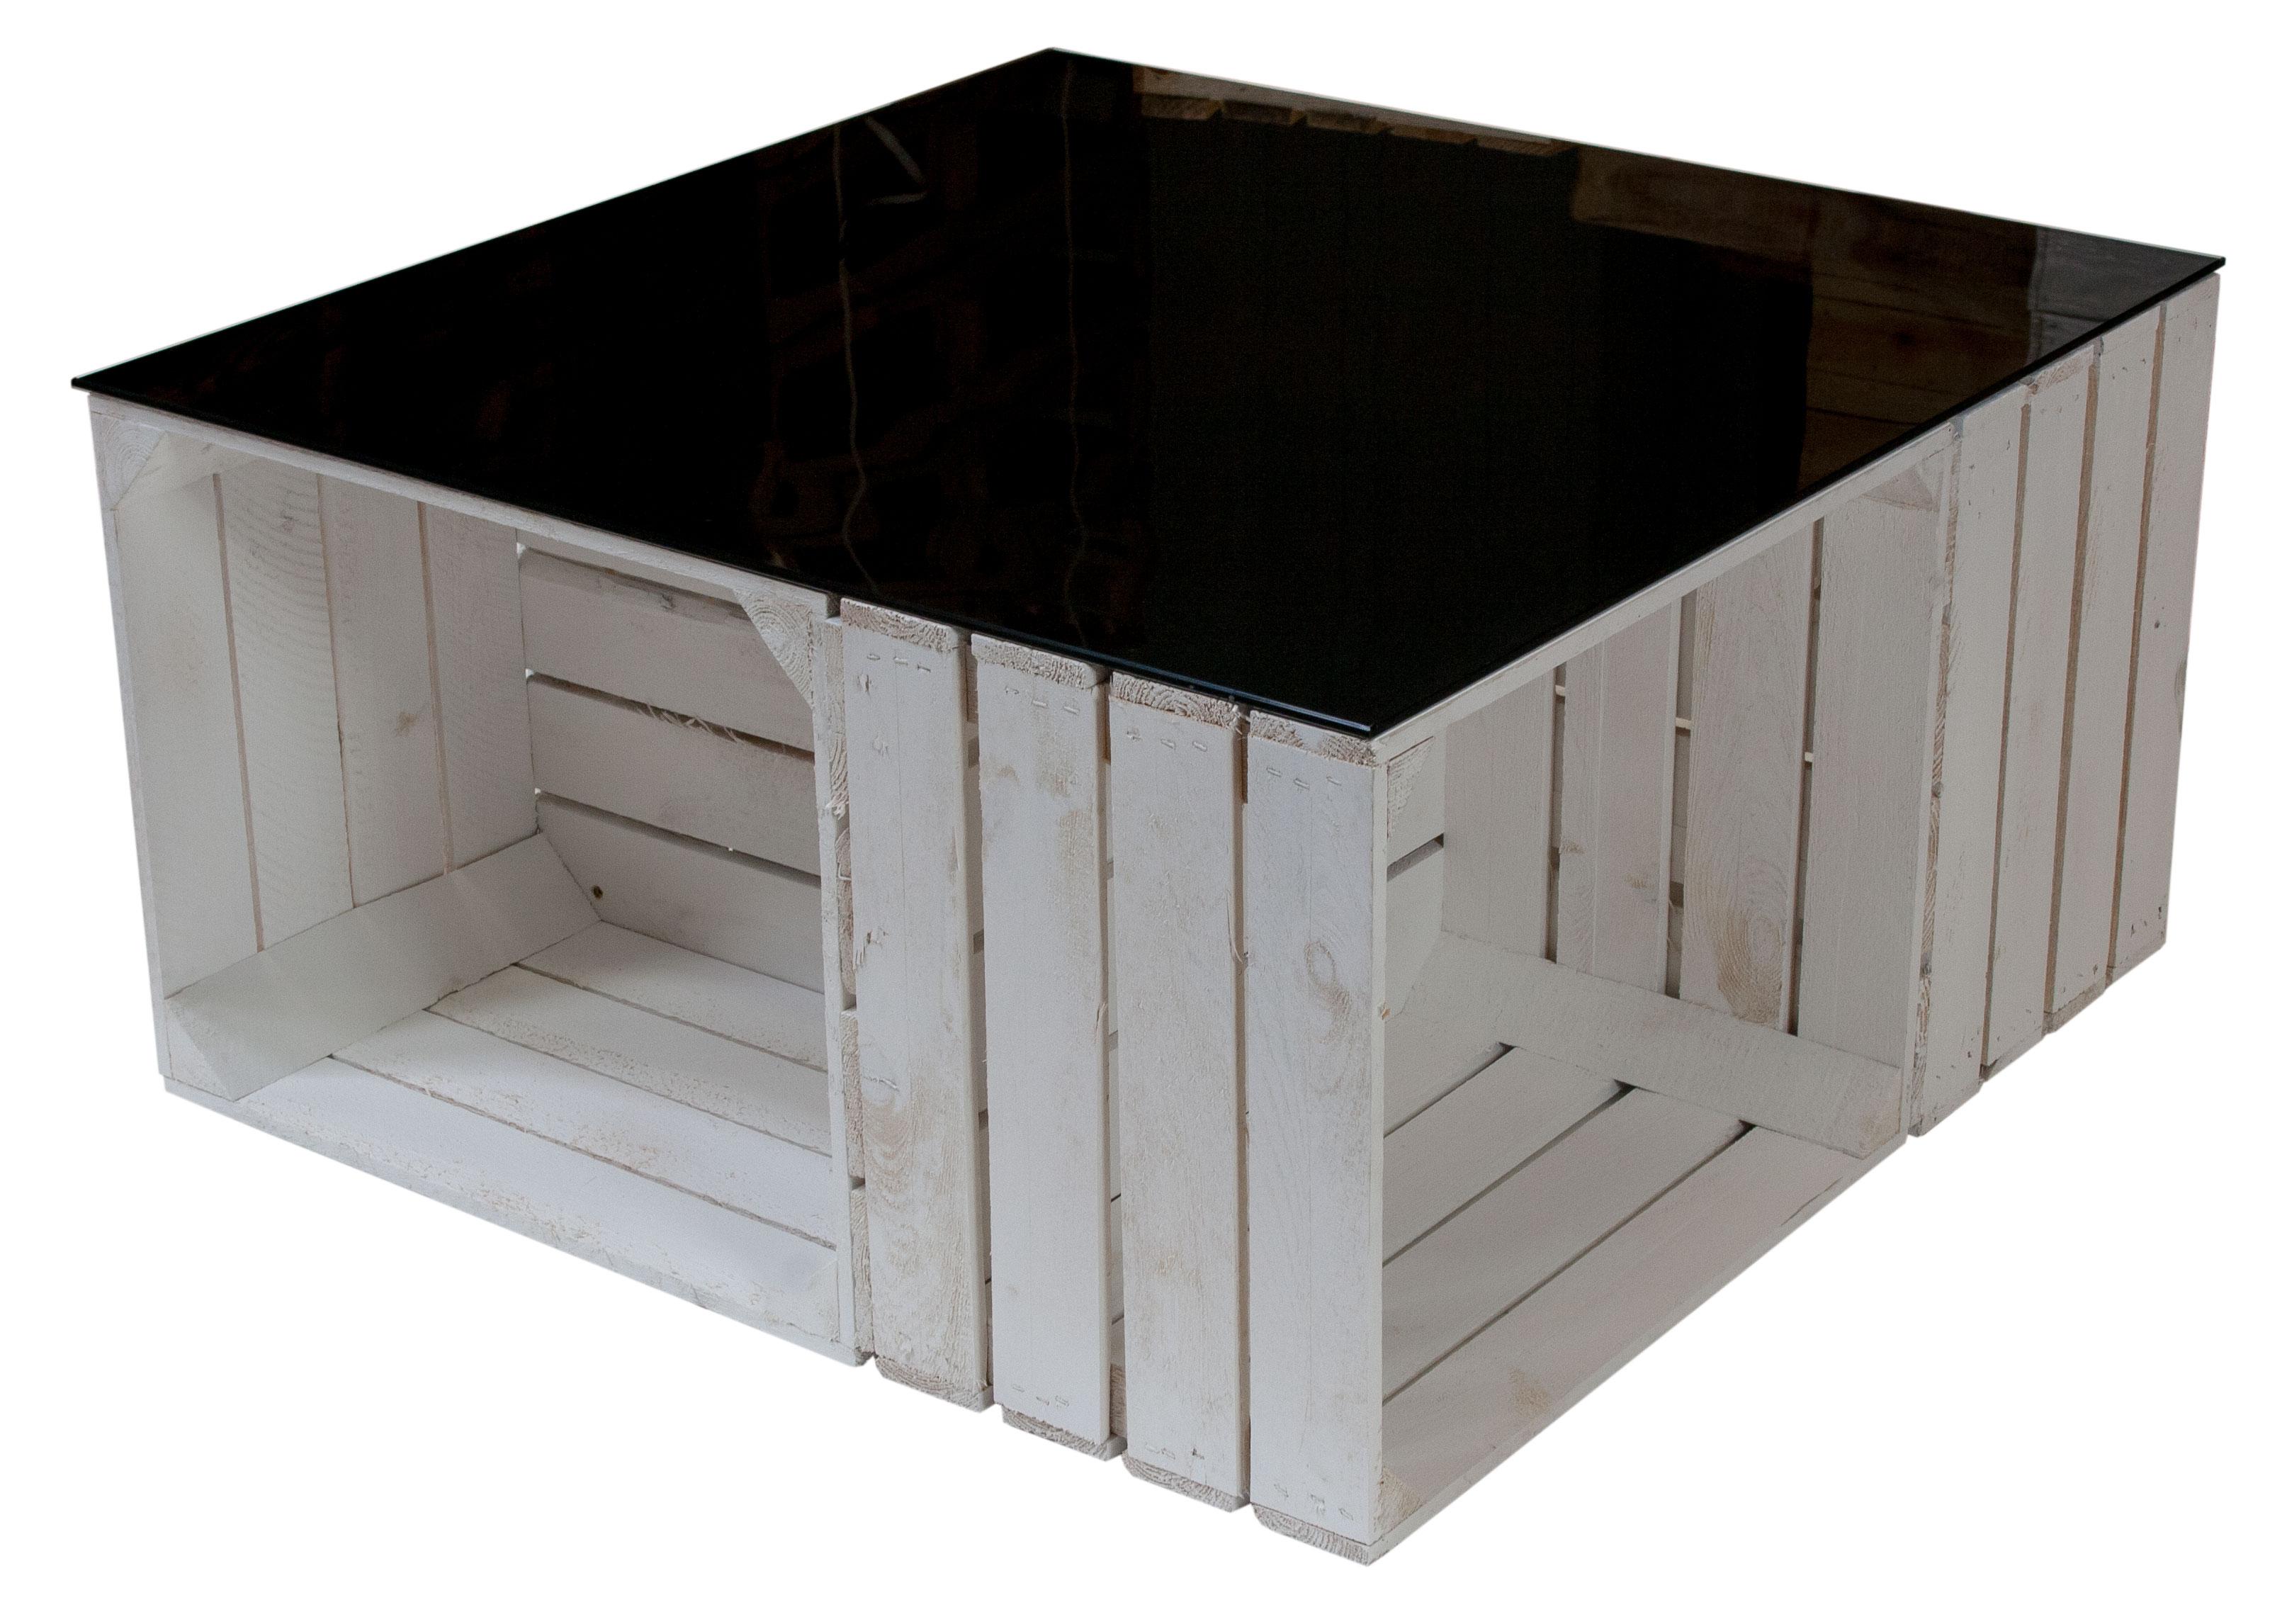 m bel couchtisch aus wei en apfelkisten auf rollen inkl. Black Bedroom Furniture Sets. Home Design Ideas